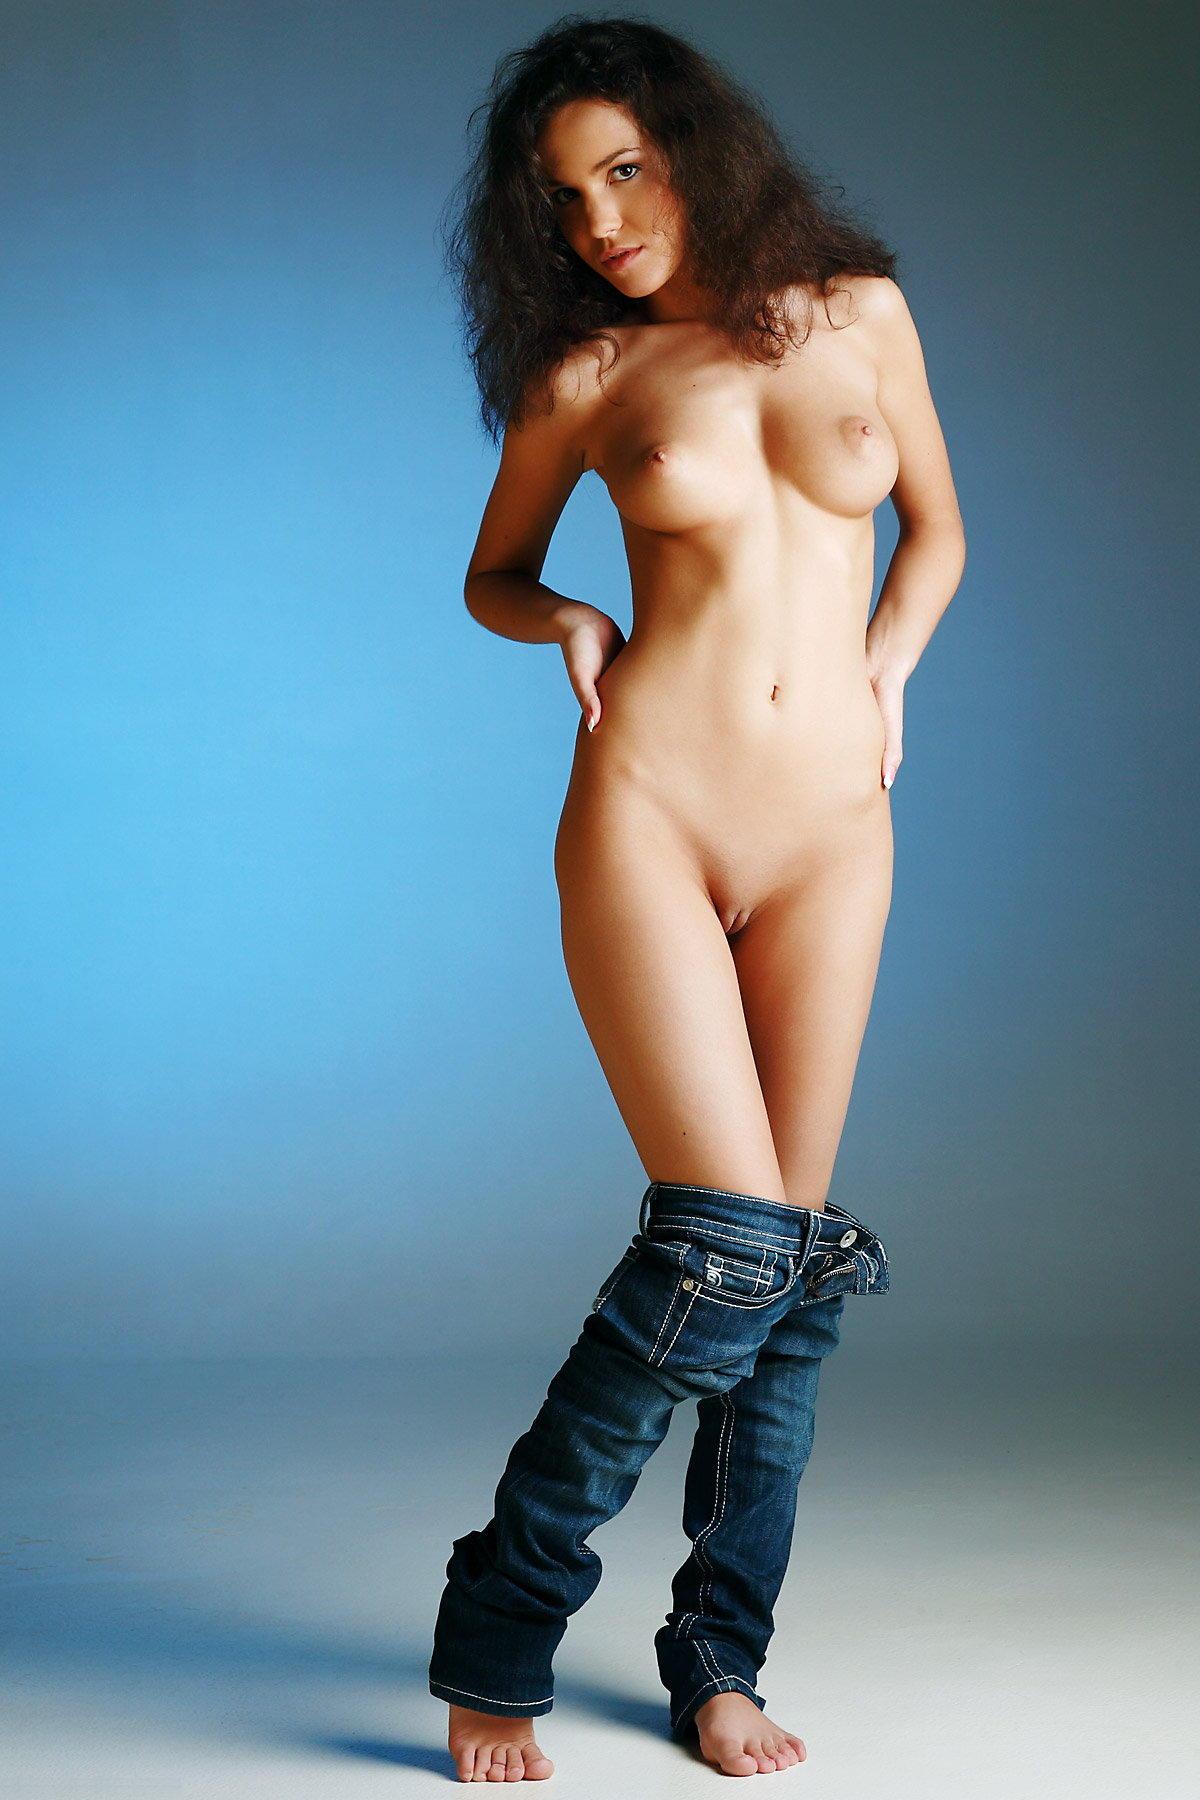 Шлюха в джинсах фото 6 фотография